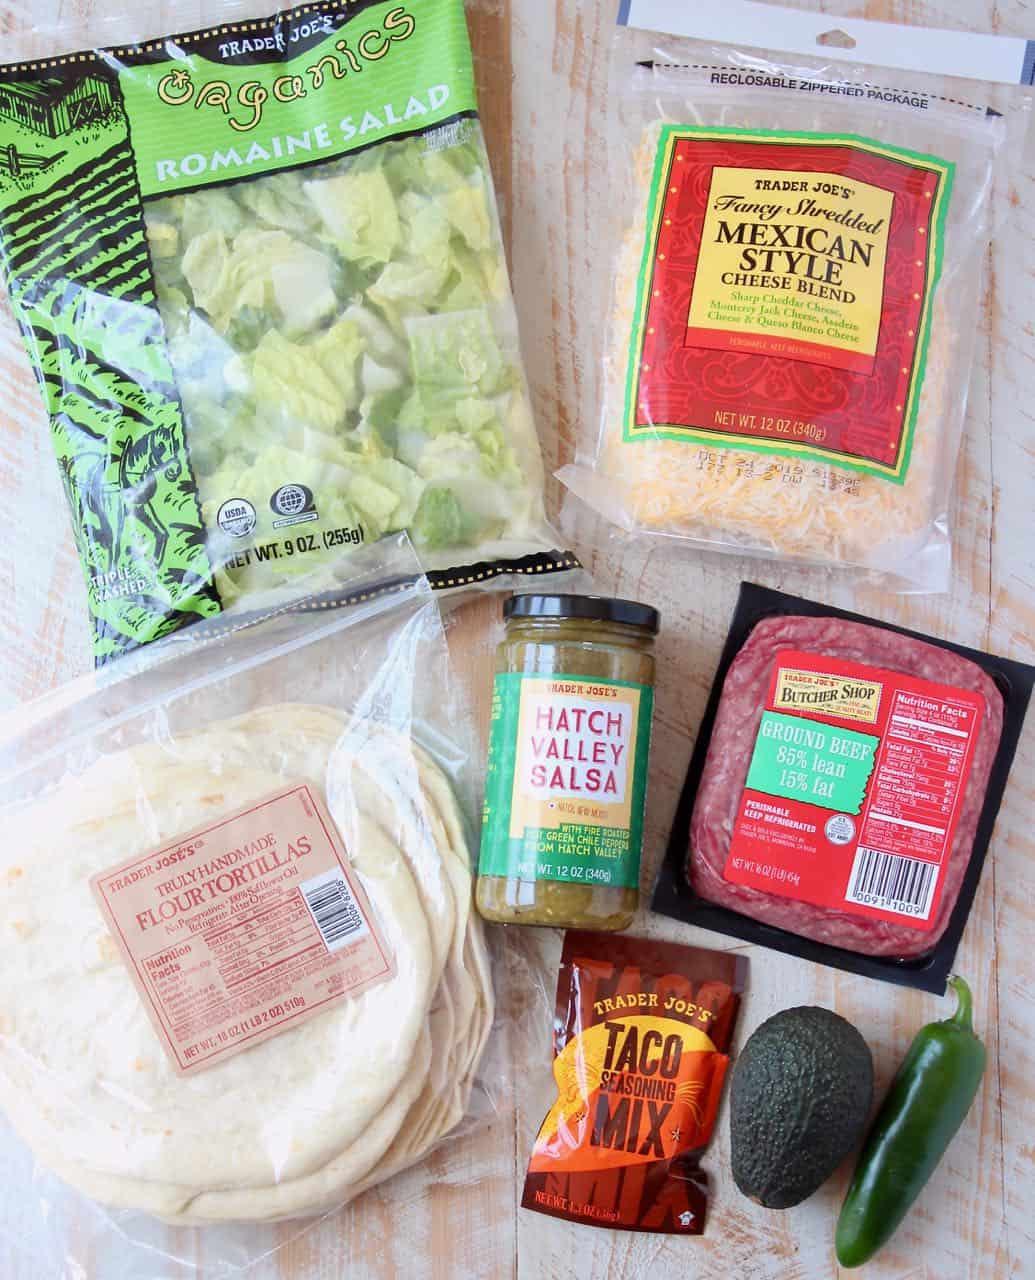 Ingredients for Trader Joe's Tacos